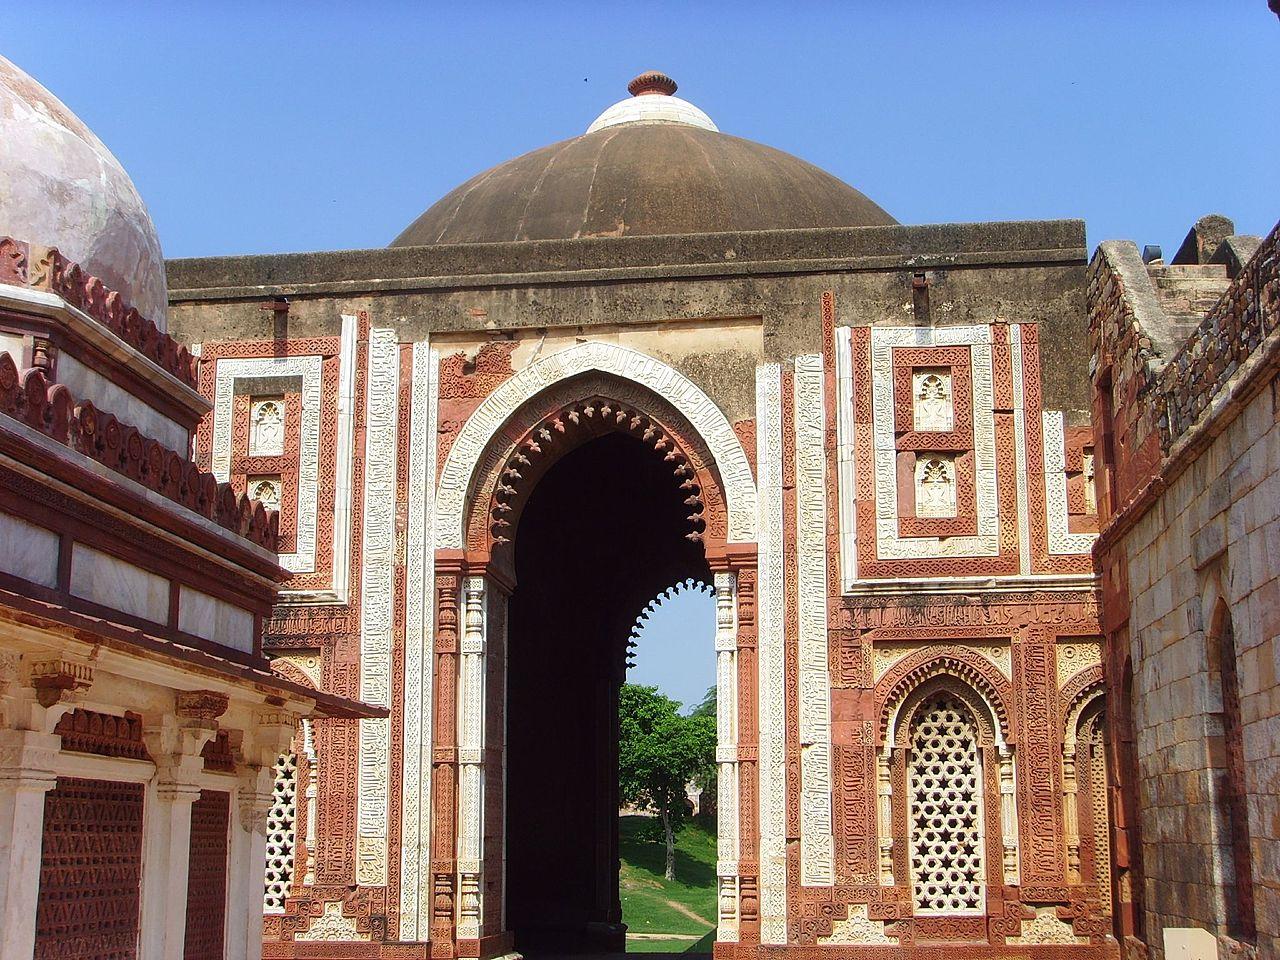 1280px-Delhi_-_Alai_Darwaza_at_Qutb_complex.jpg